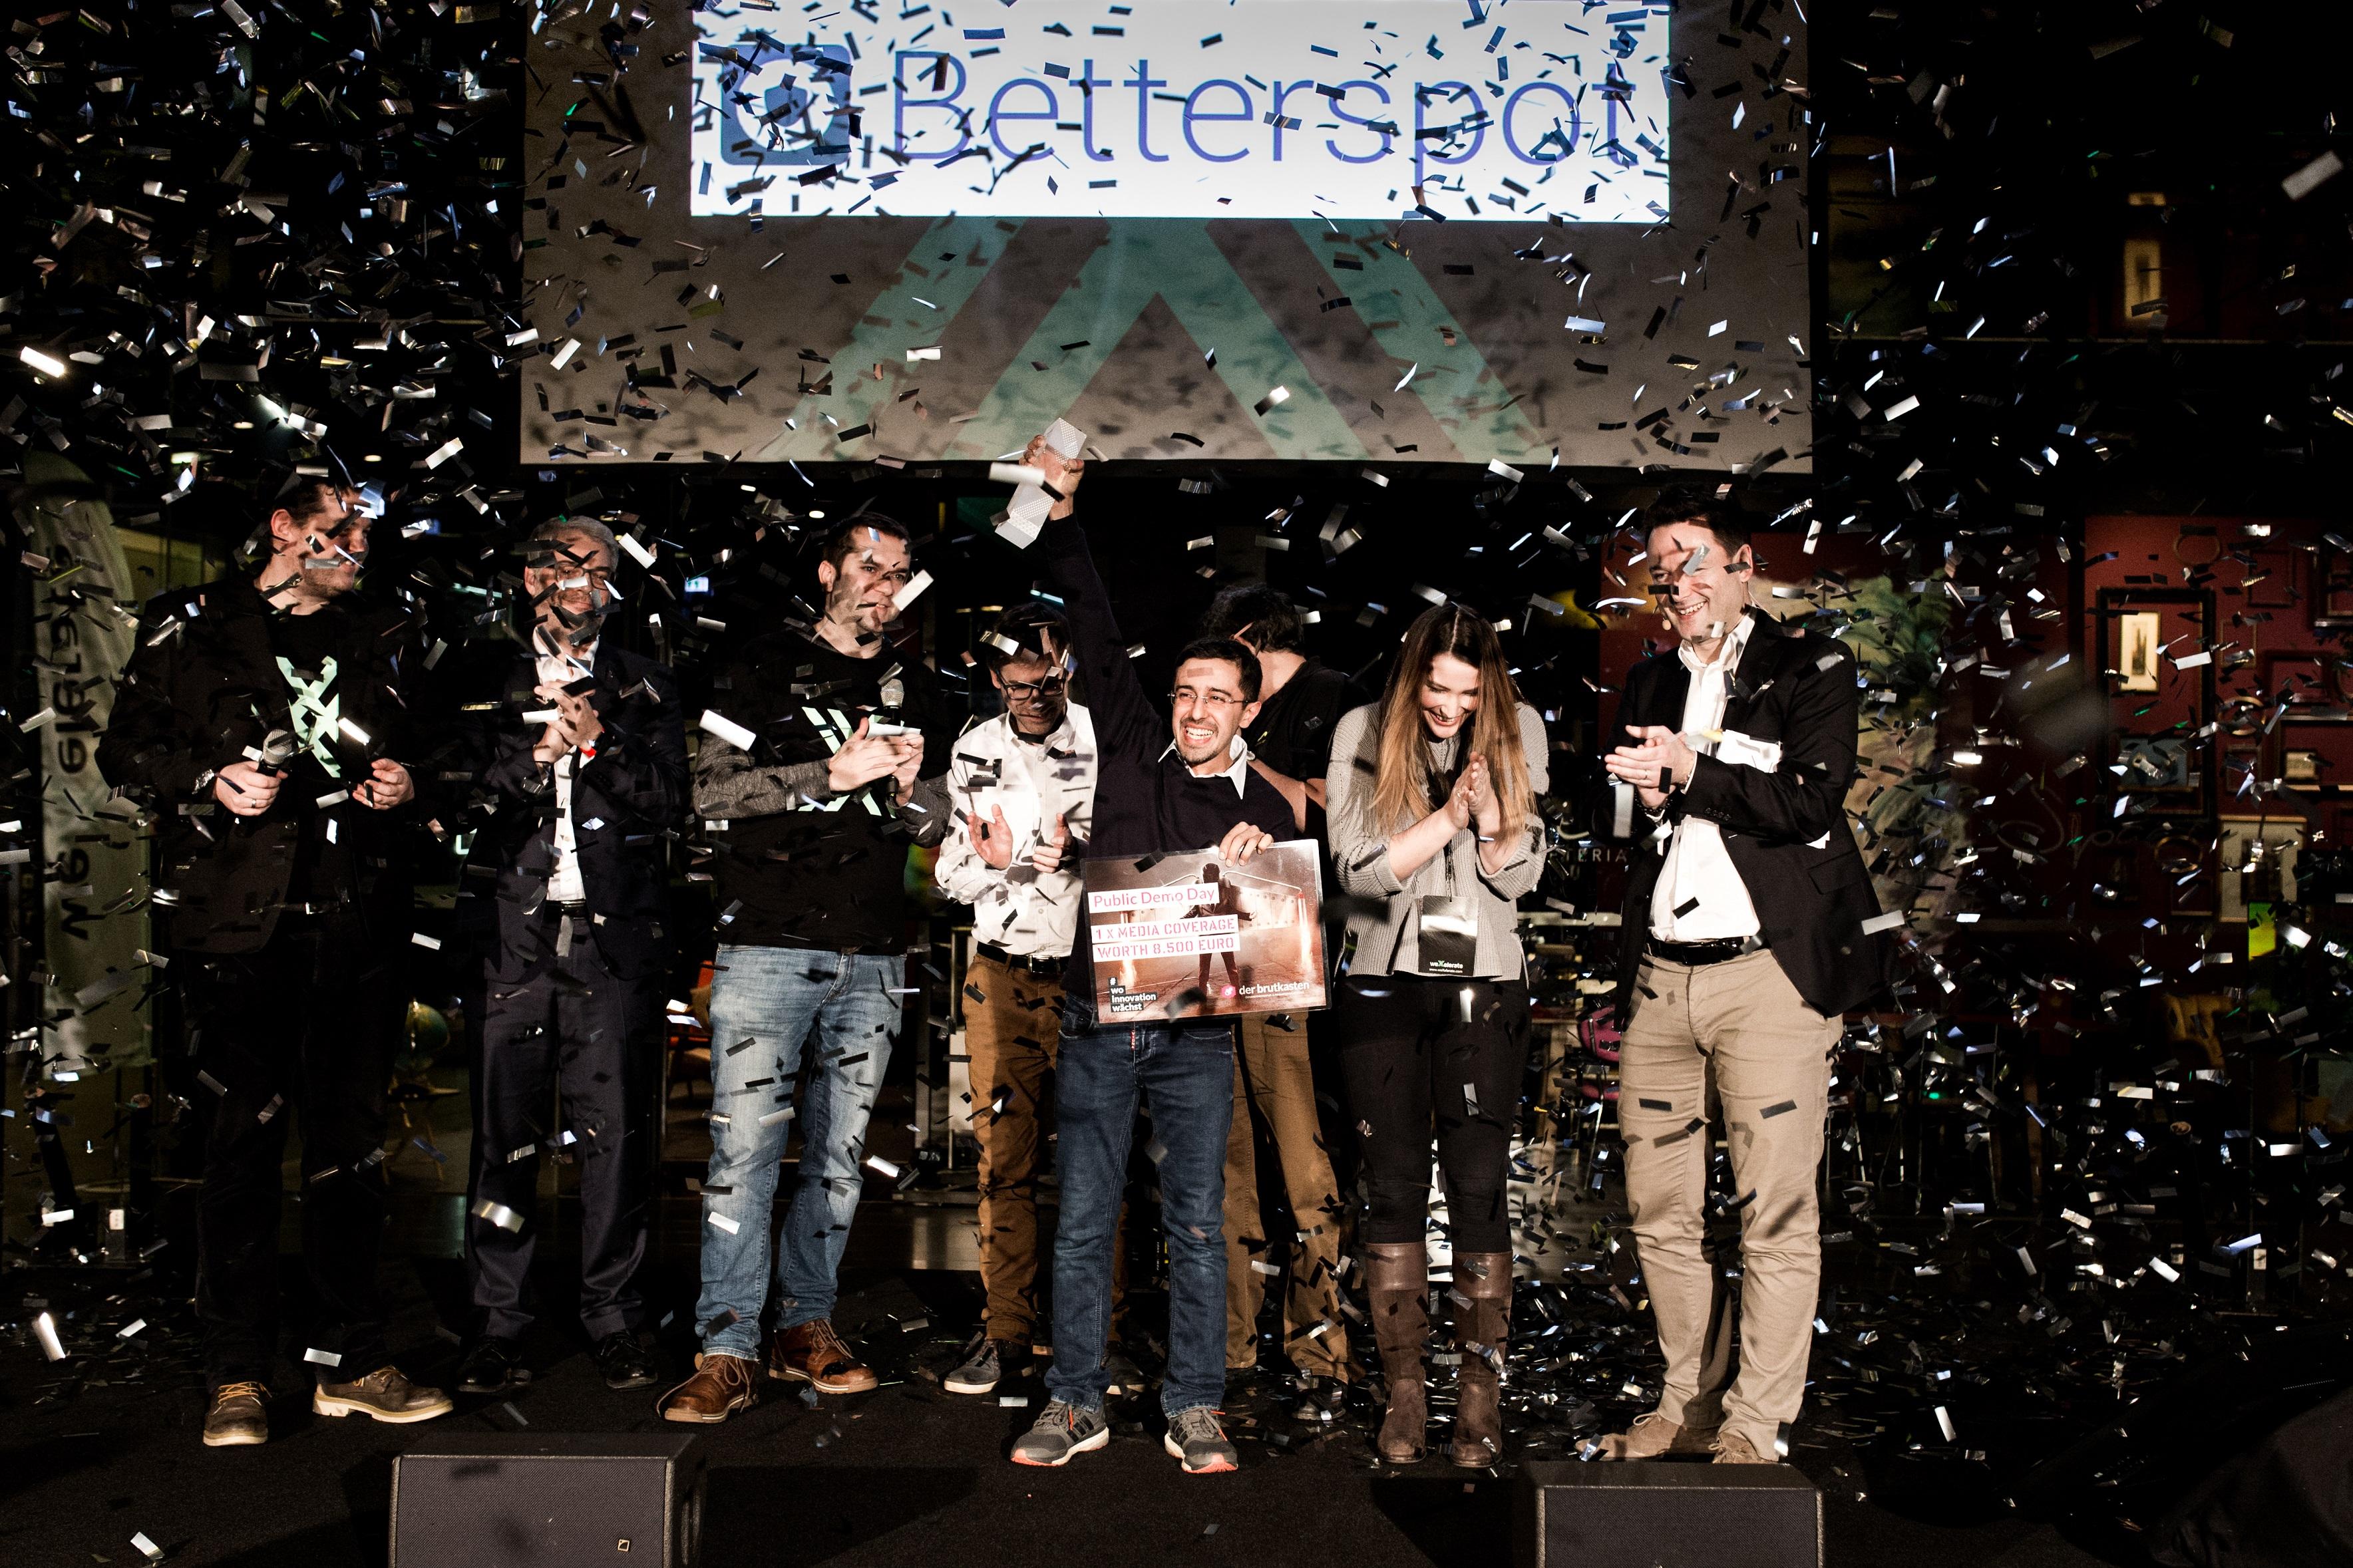 Betterspot a CyberTrap vyhrali finálny Demo Day prvého turnusu akceleračného programu 3